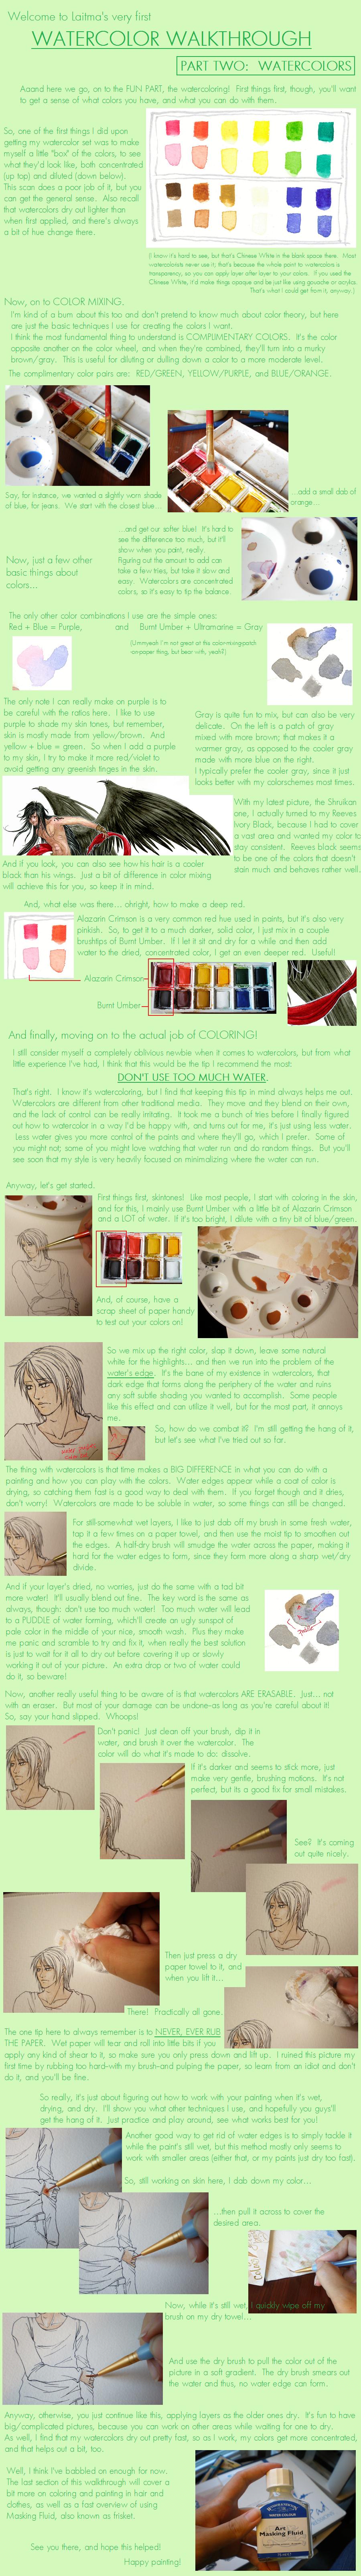 Watercolor Walkthrough Part 2 by Laitma